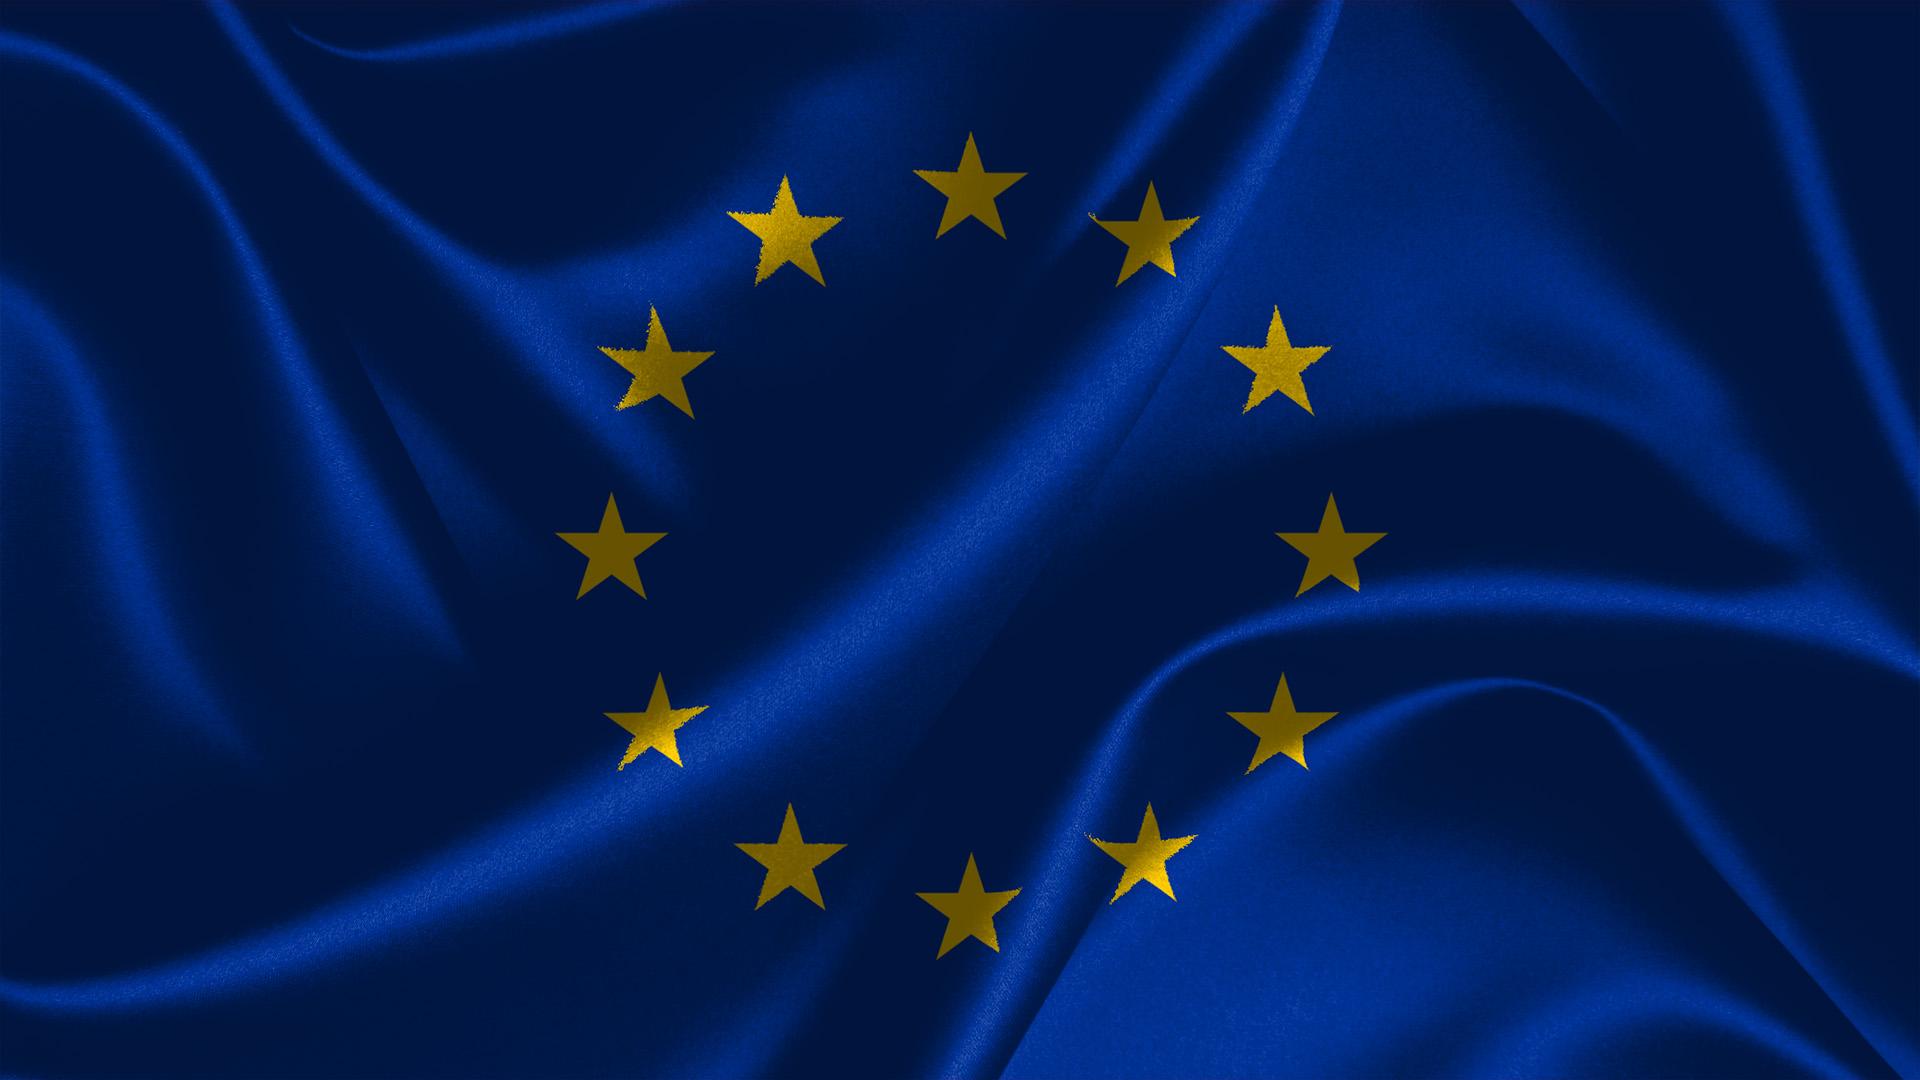 Europaflagge Bild